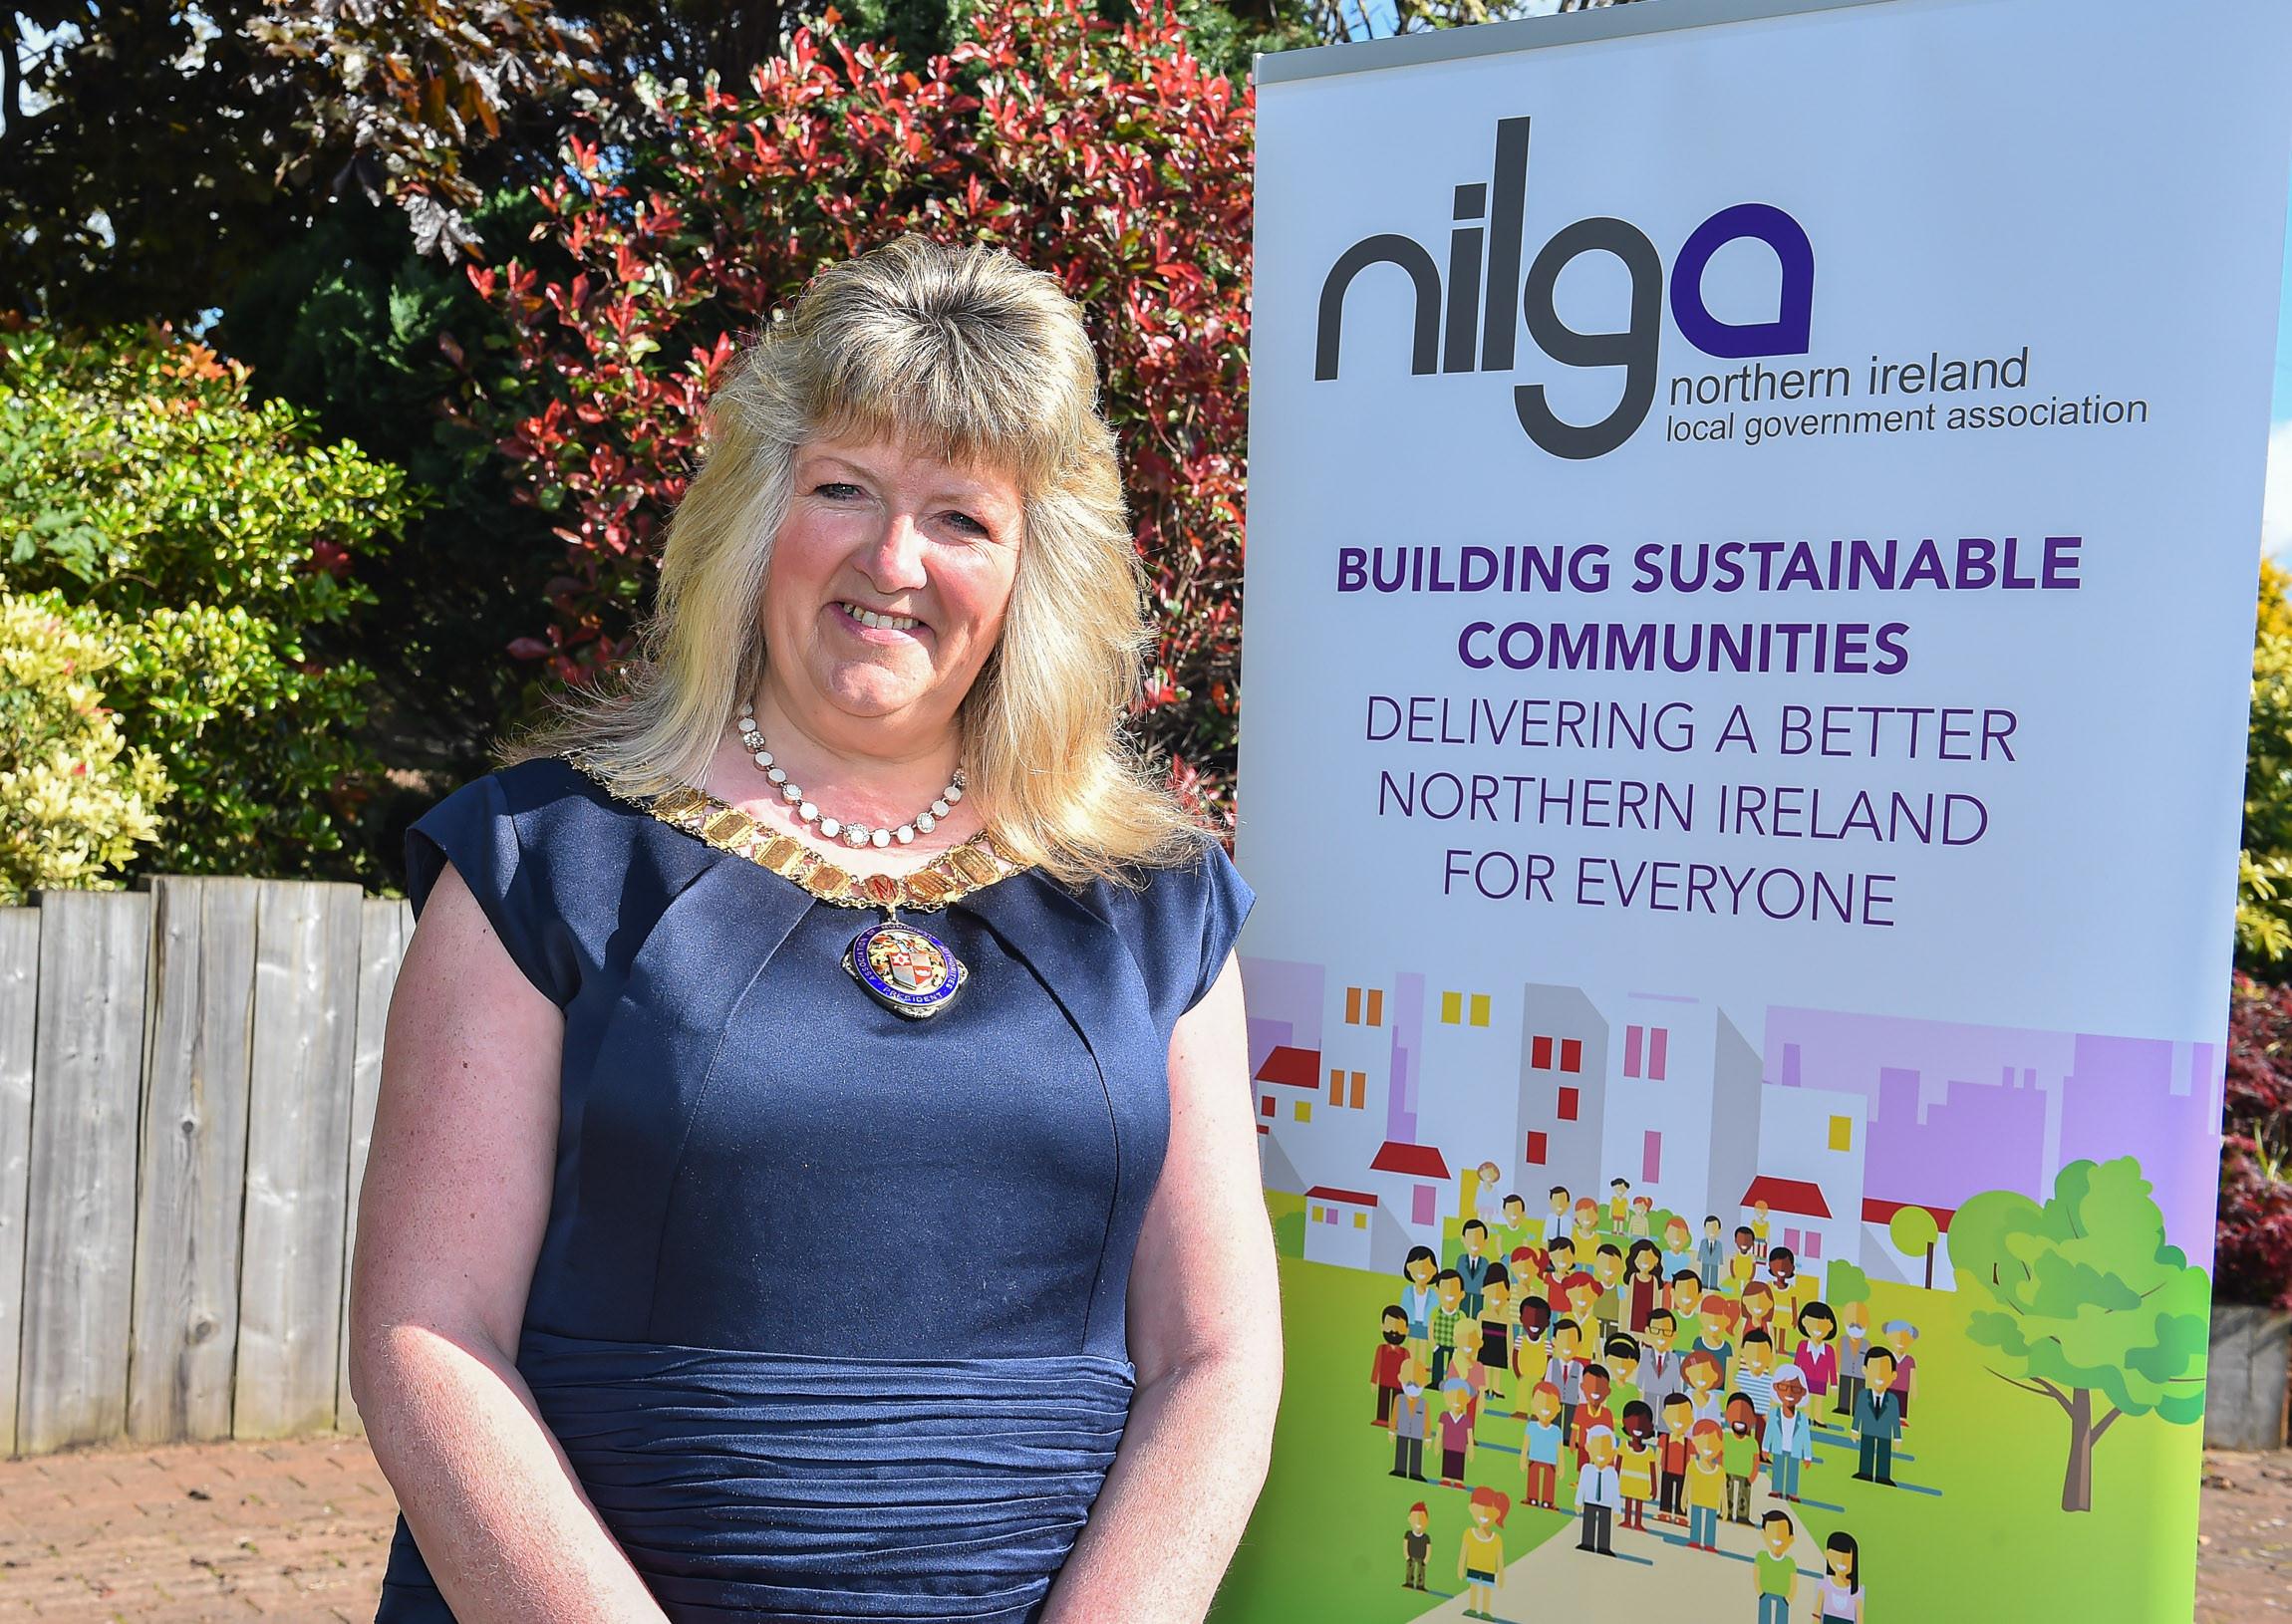 New NILGA President Cllr Frances Burton